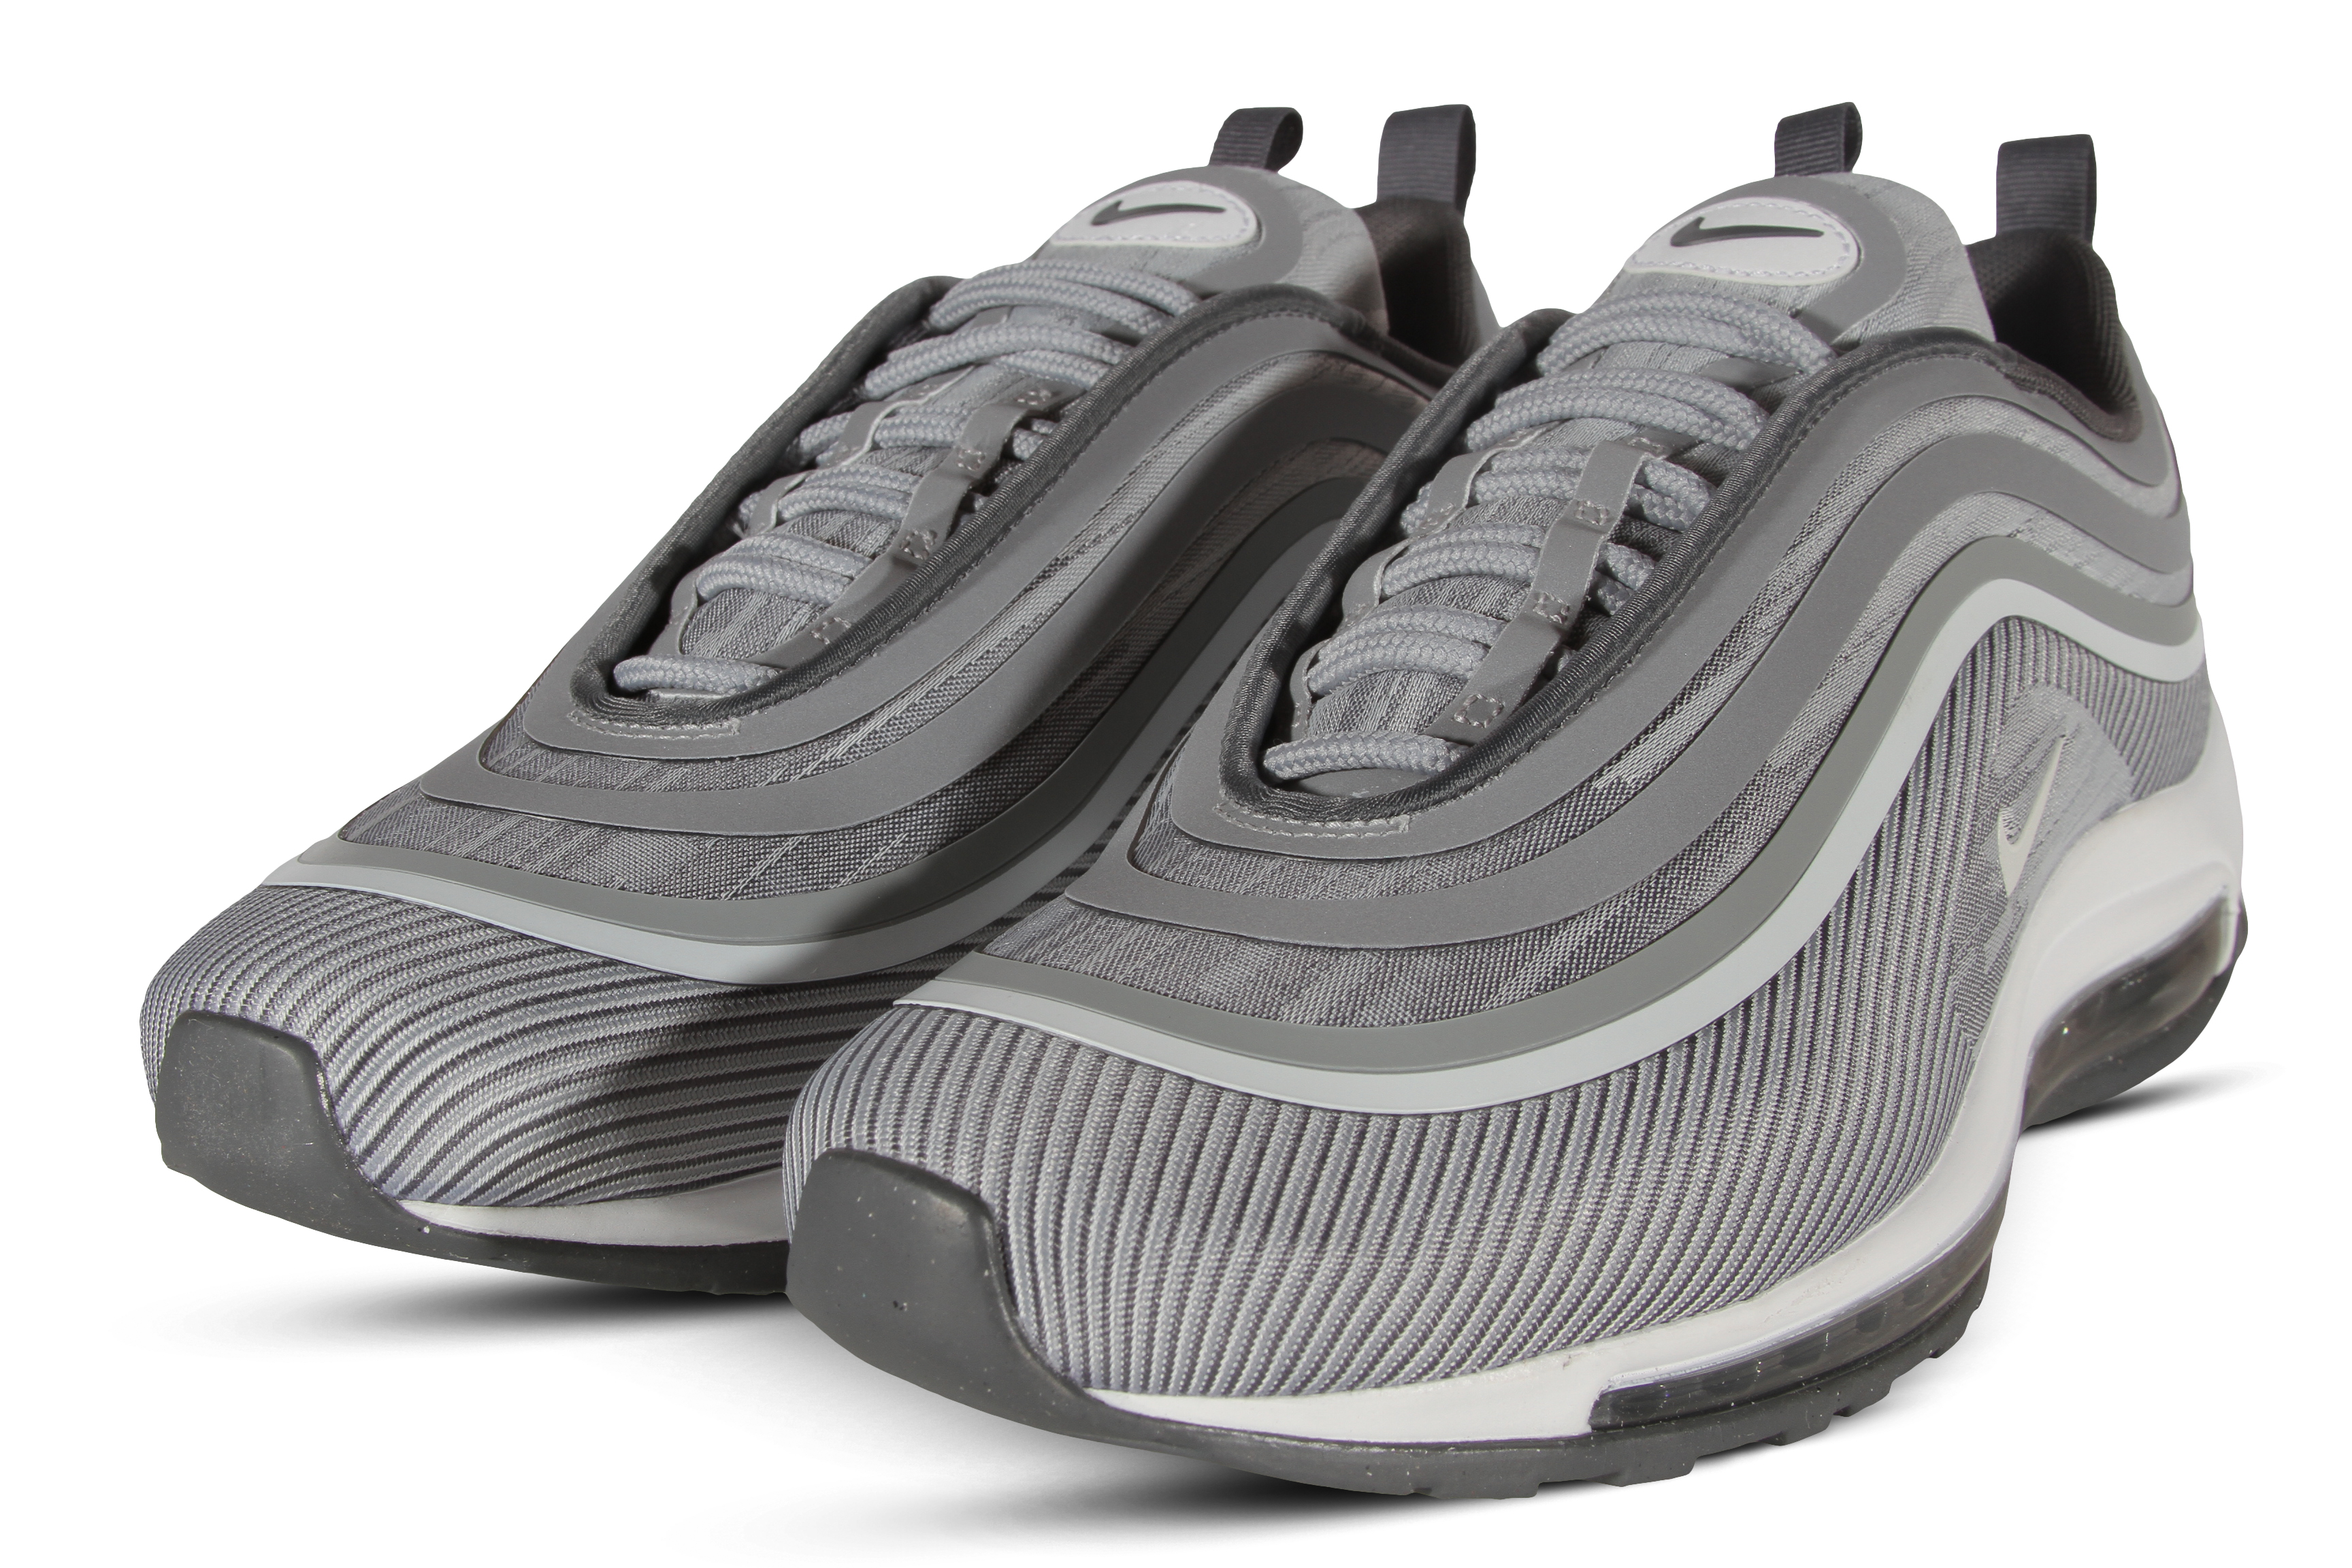 official photos 8659d 118bc ... Nike Air Max UL  17 Men s Running Shoes 918356-007 918356-007 918356 ...